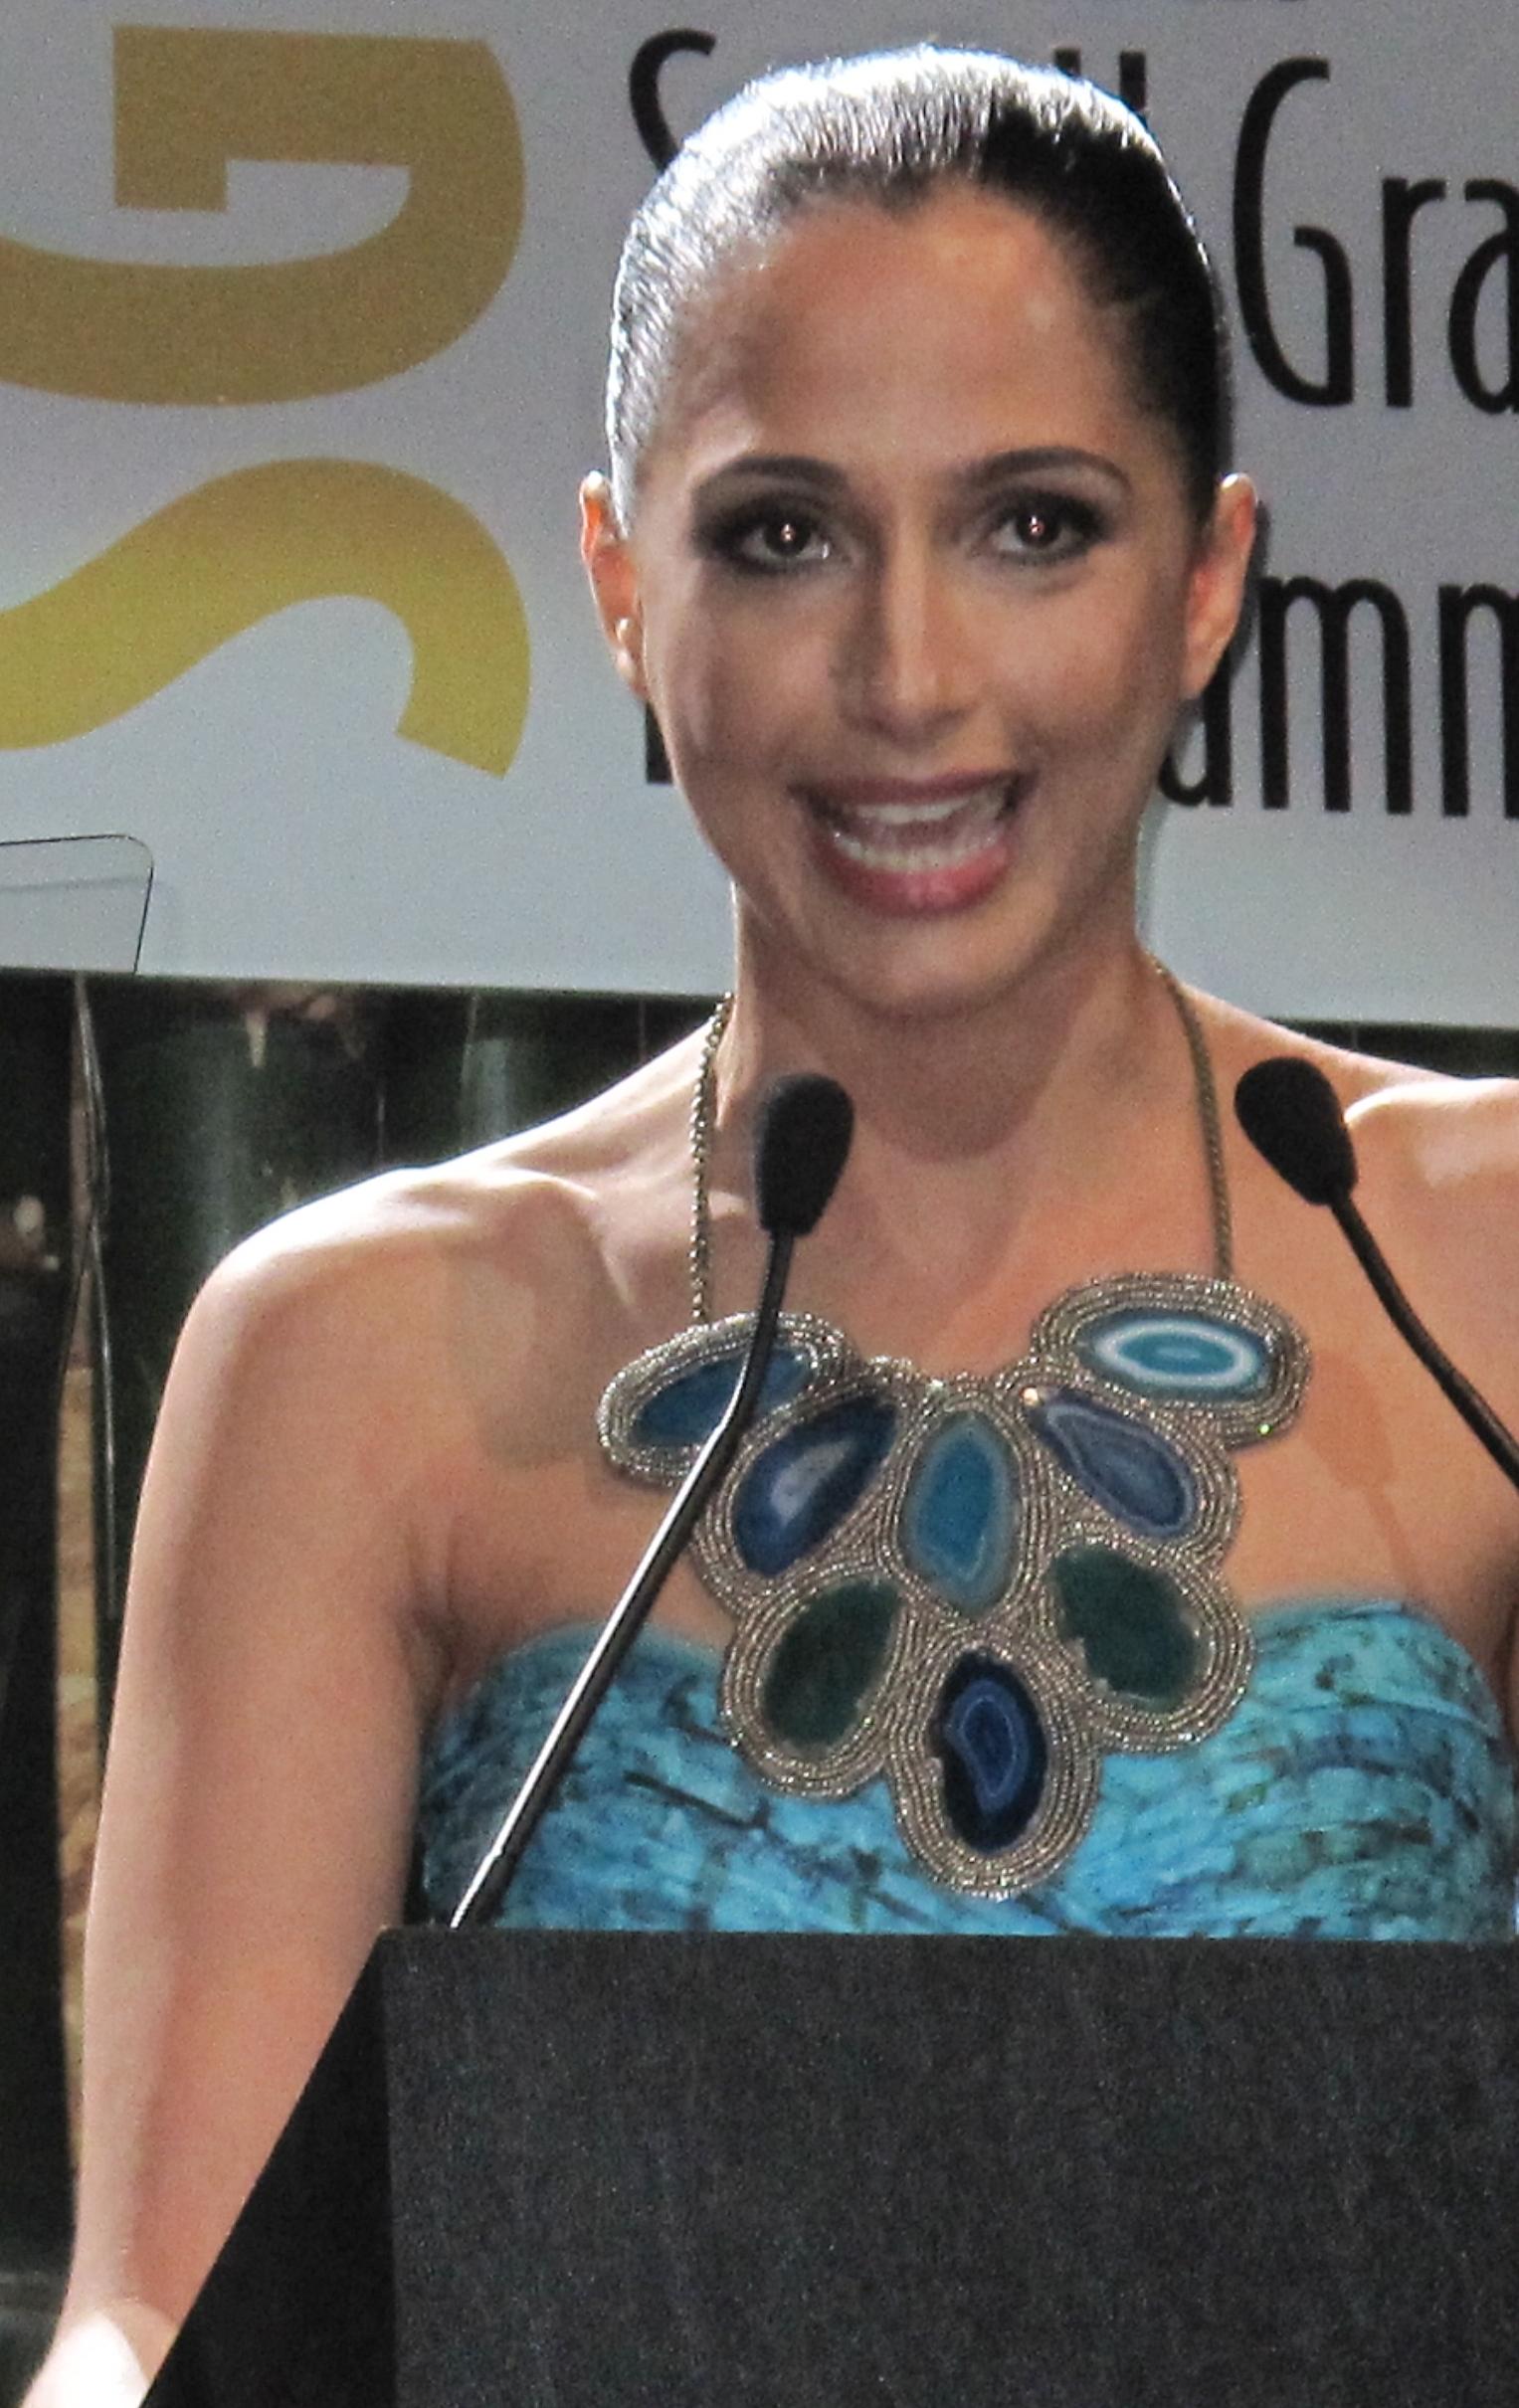 Fotos De Camila Pitanga Nua camila pitanga – wikipedia